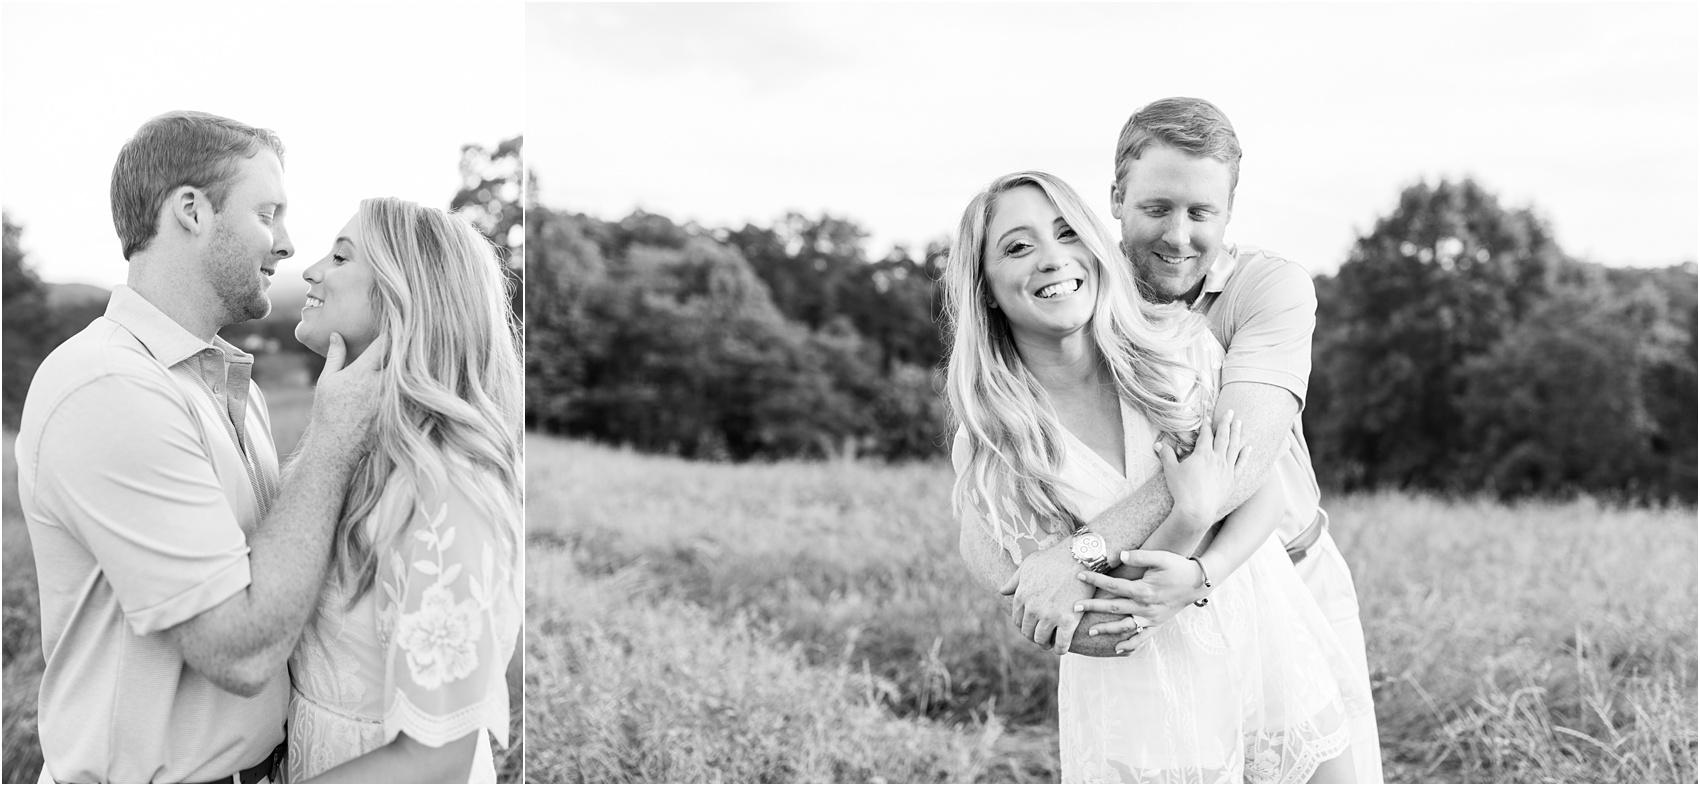 Savannah Eve Photography LLC- Henry-Caffee Engagements-15.jpg